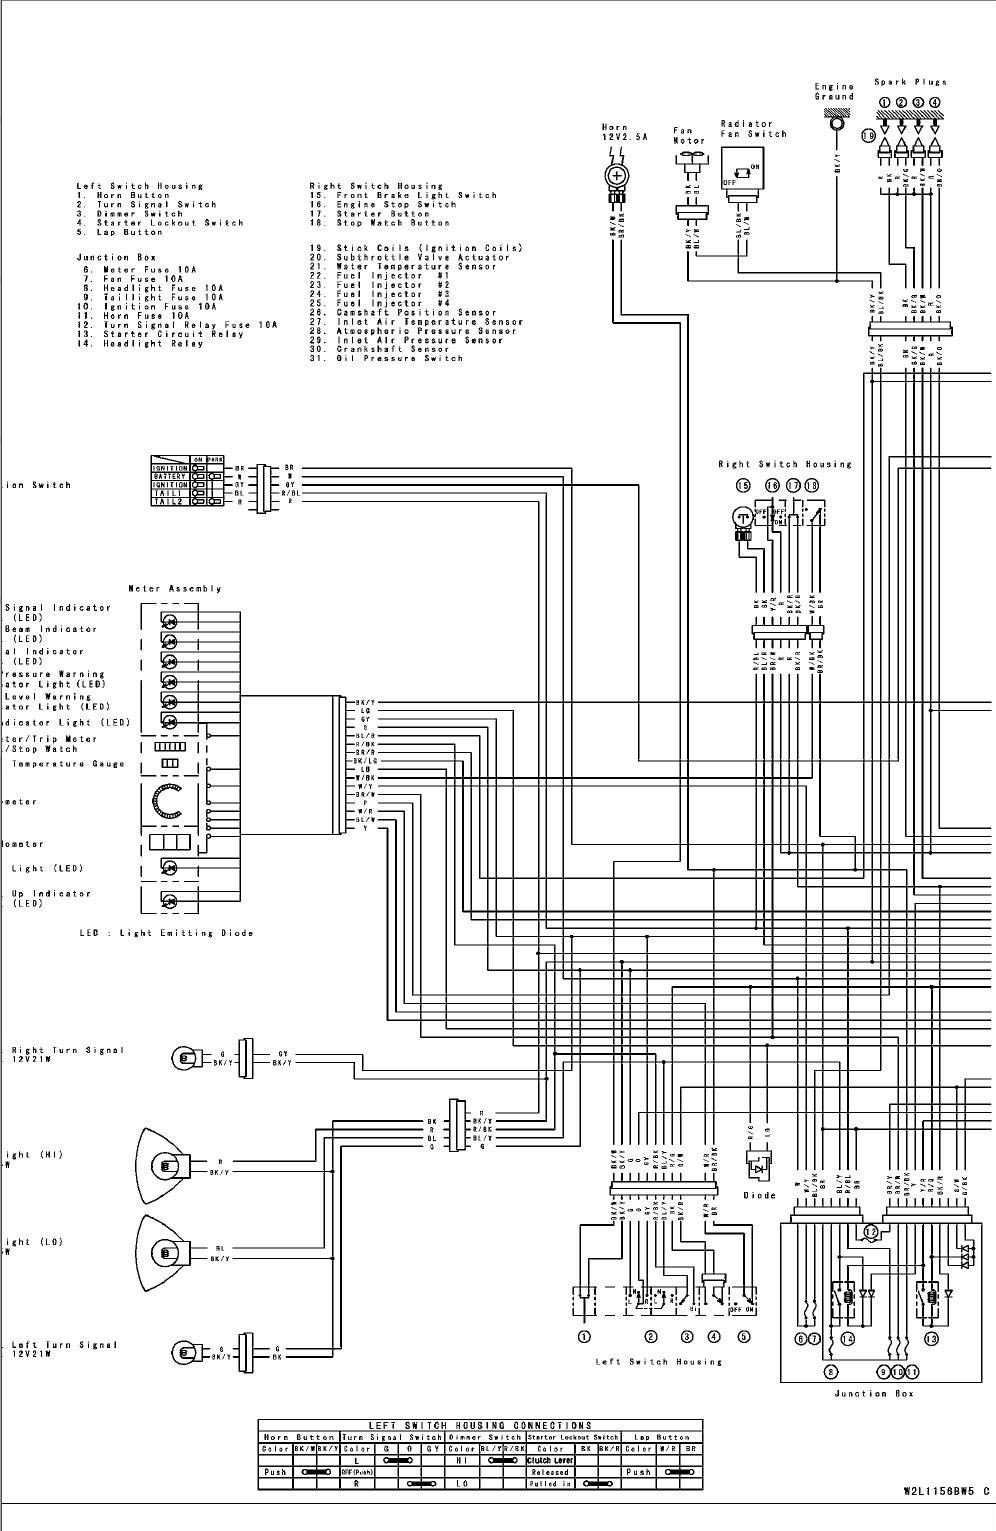 Kawasaki Zx6r Wiring Diagram wiring aftermarket headlights page | CHRISTIANS BIKE | Aftermarket